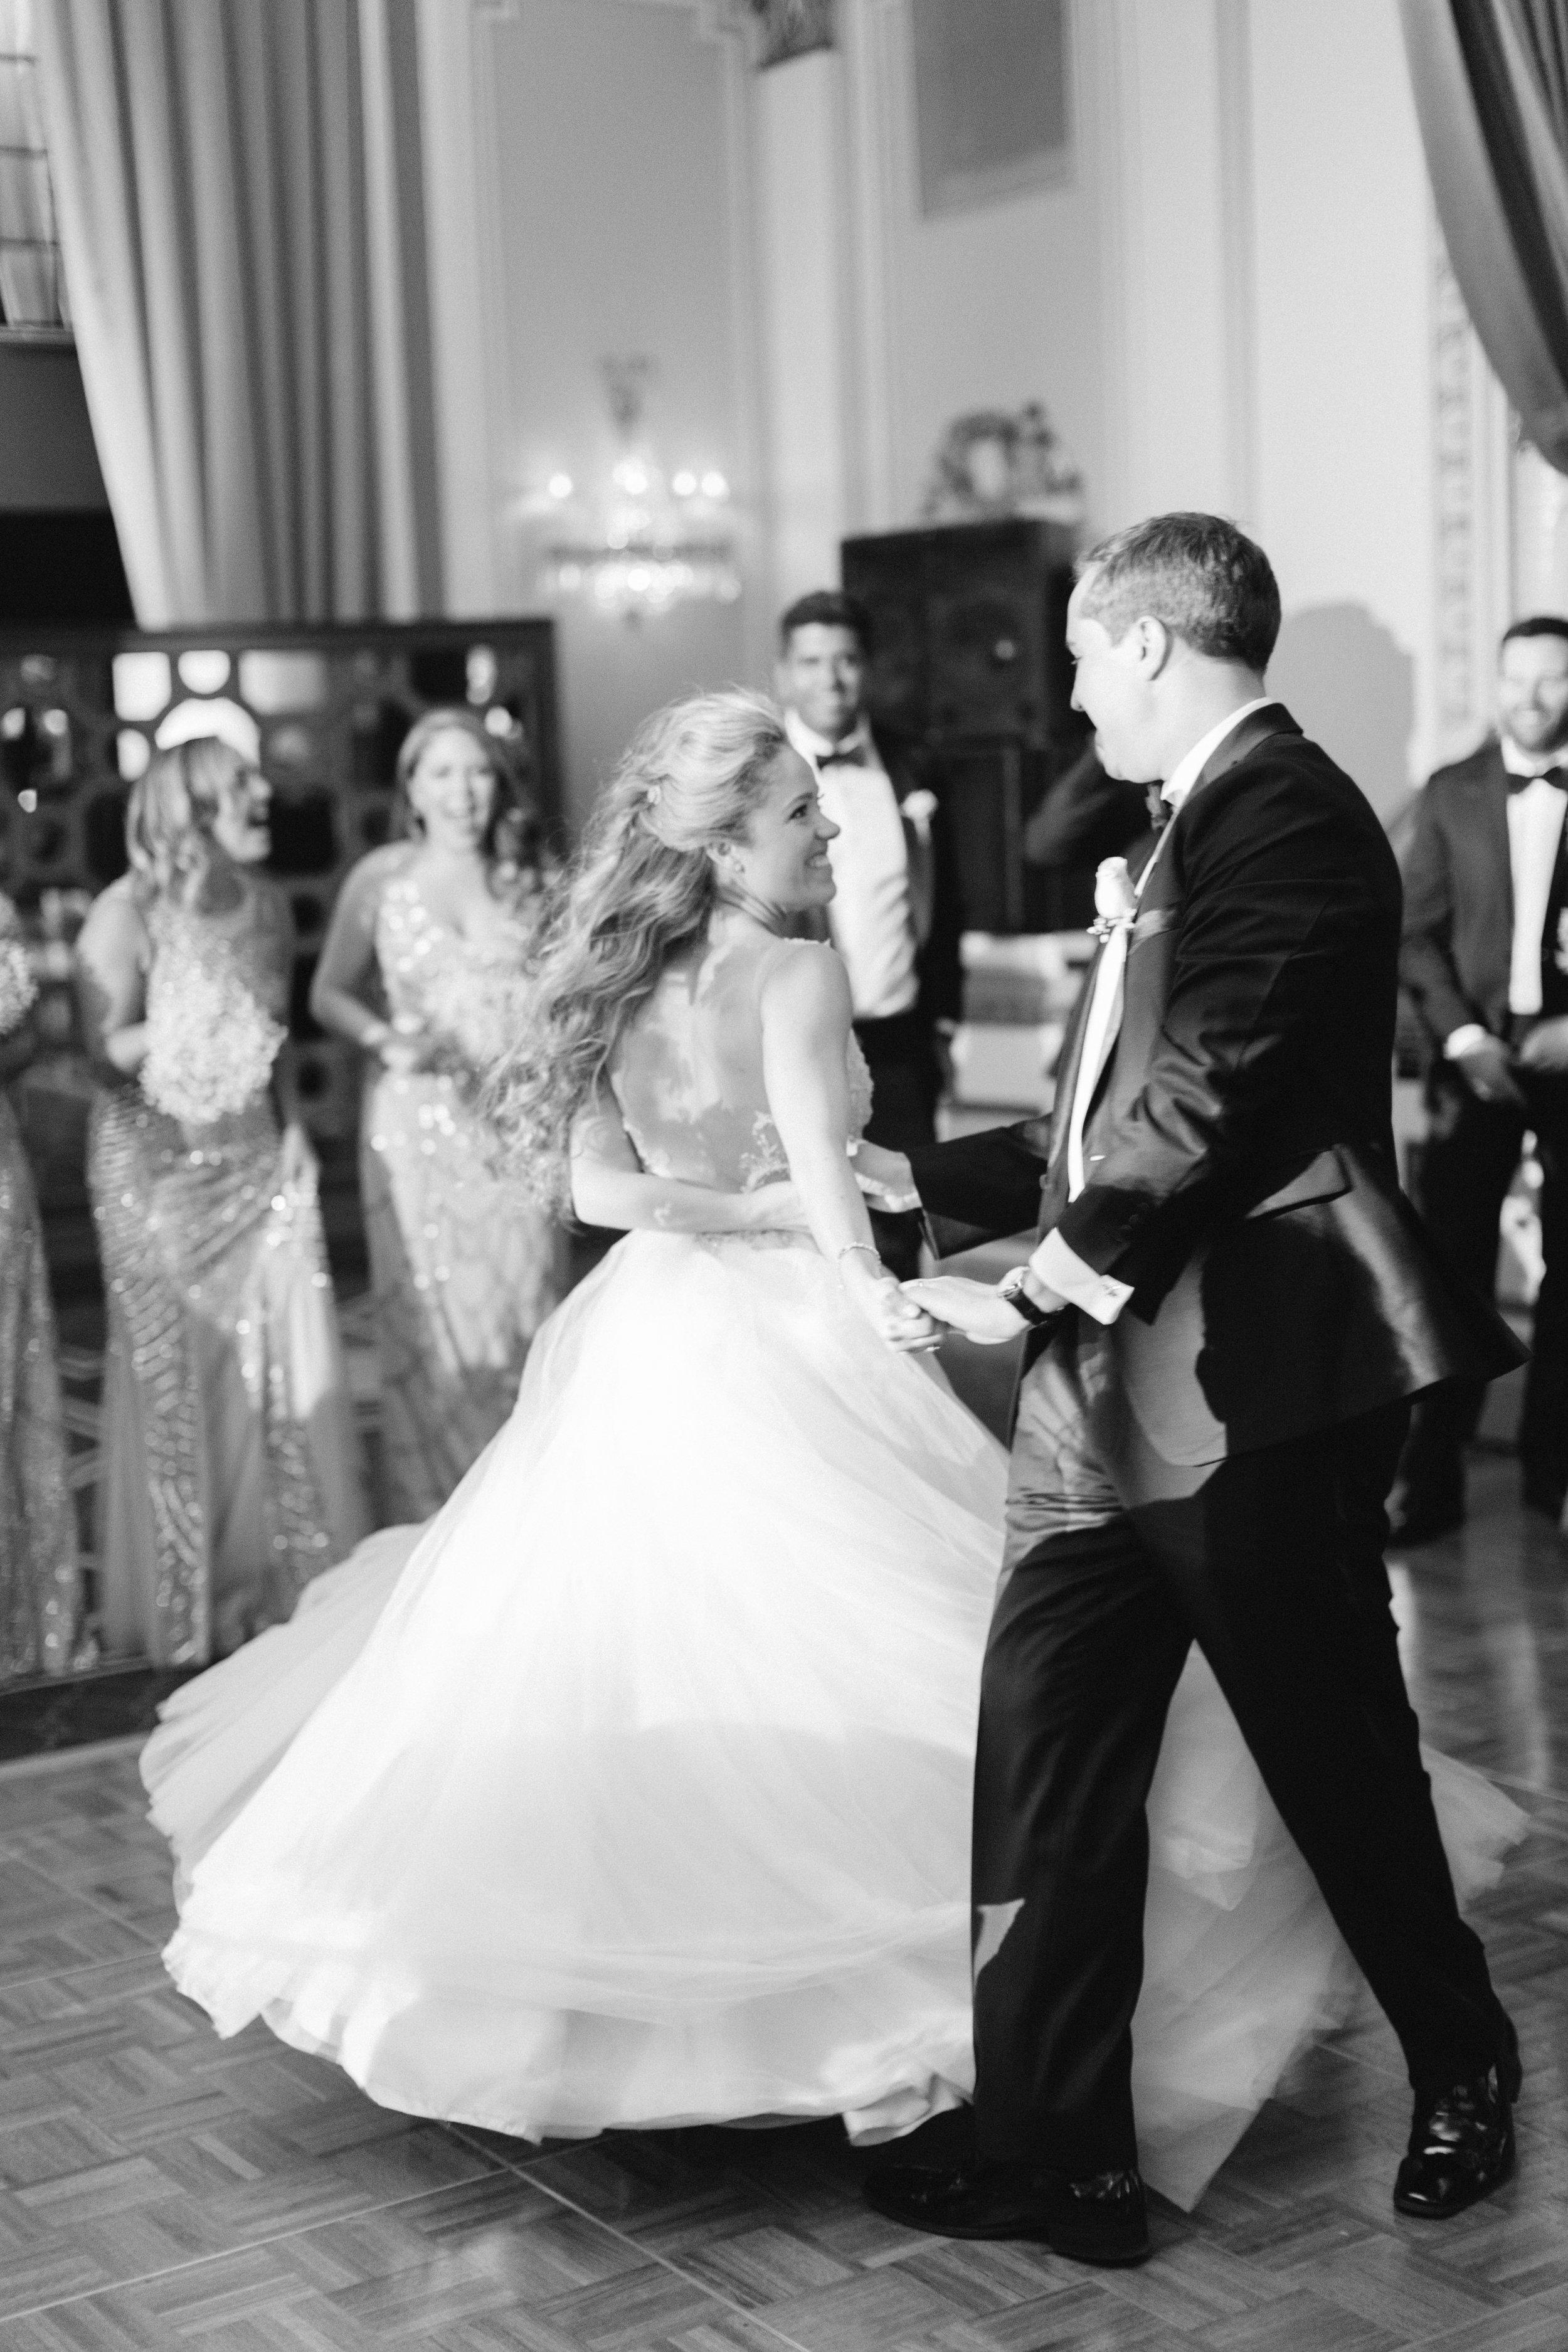 chateau-frontenac-quebec-city-best-toronto-wedding-photographer-soft-bright-pastel-richelle-hunter-elliott-heidi-855.jpg